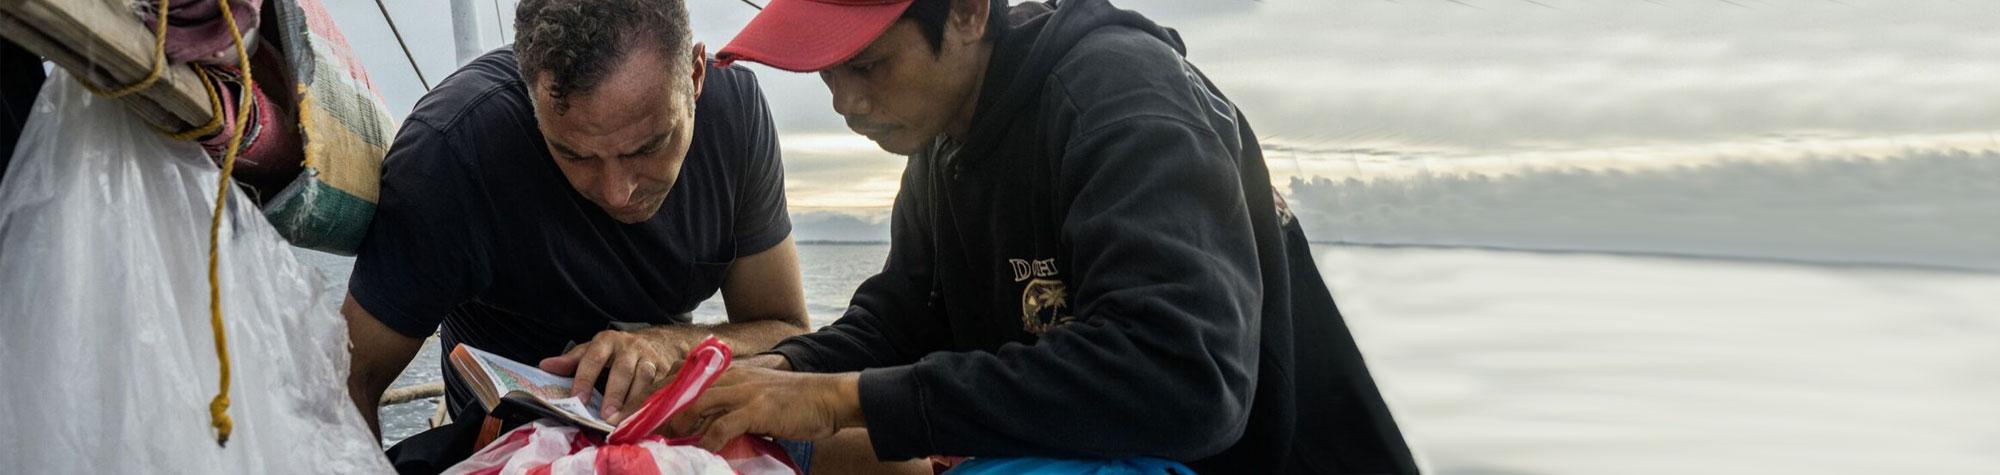 Ian Urbina & The Outlaw Ocean | Human Trafficking at Sea